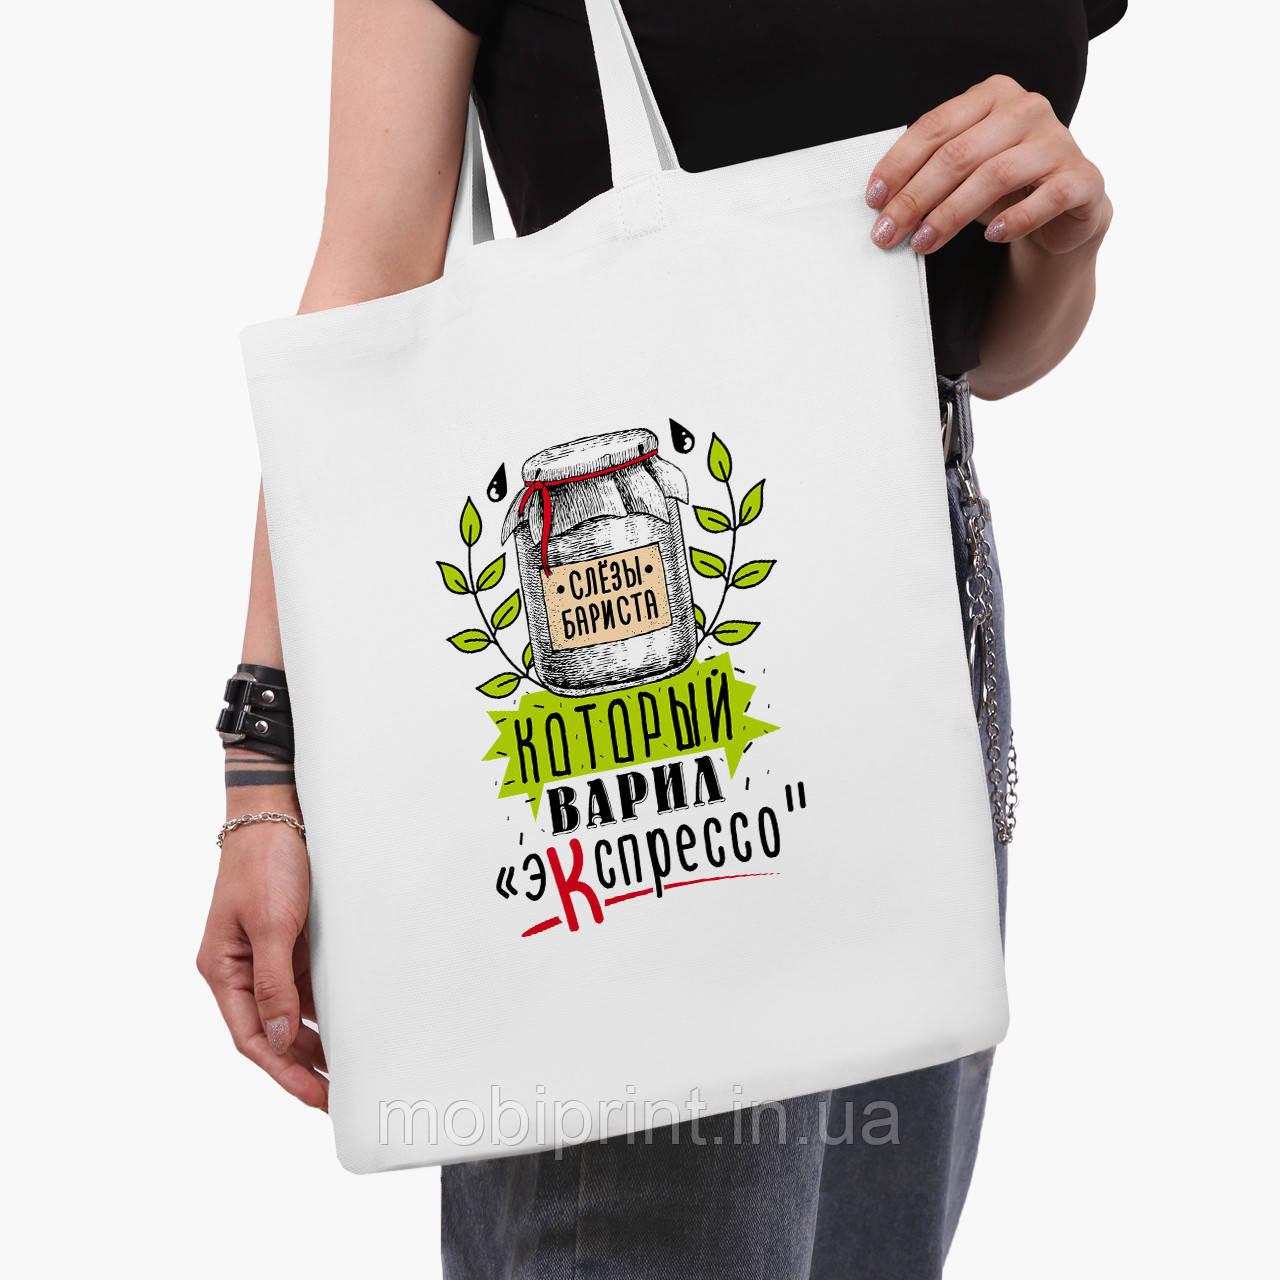 Эко сумка шоппер белая Слёзы баристы (Barista tears) (9227-1278-3)  41*35 см